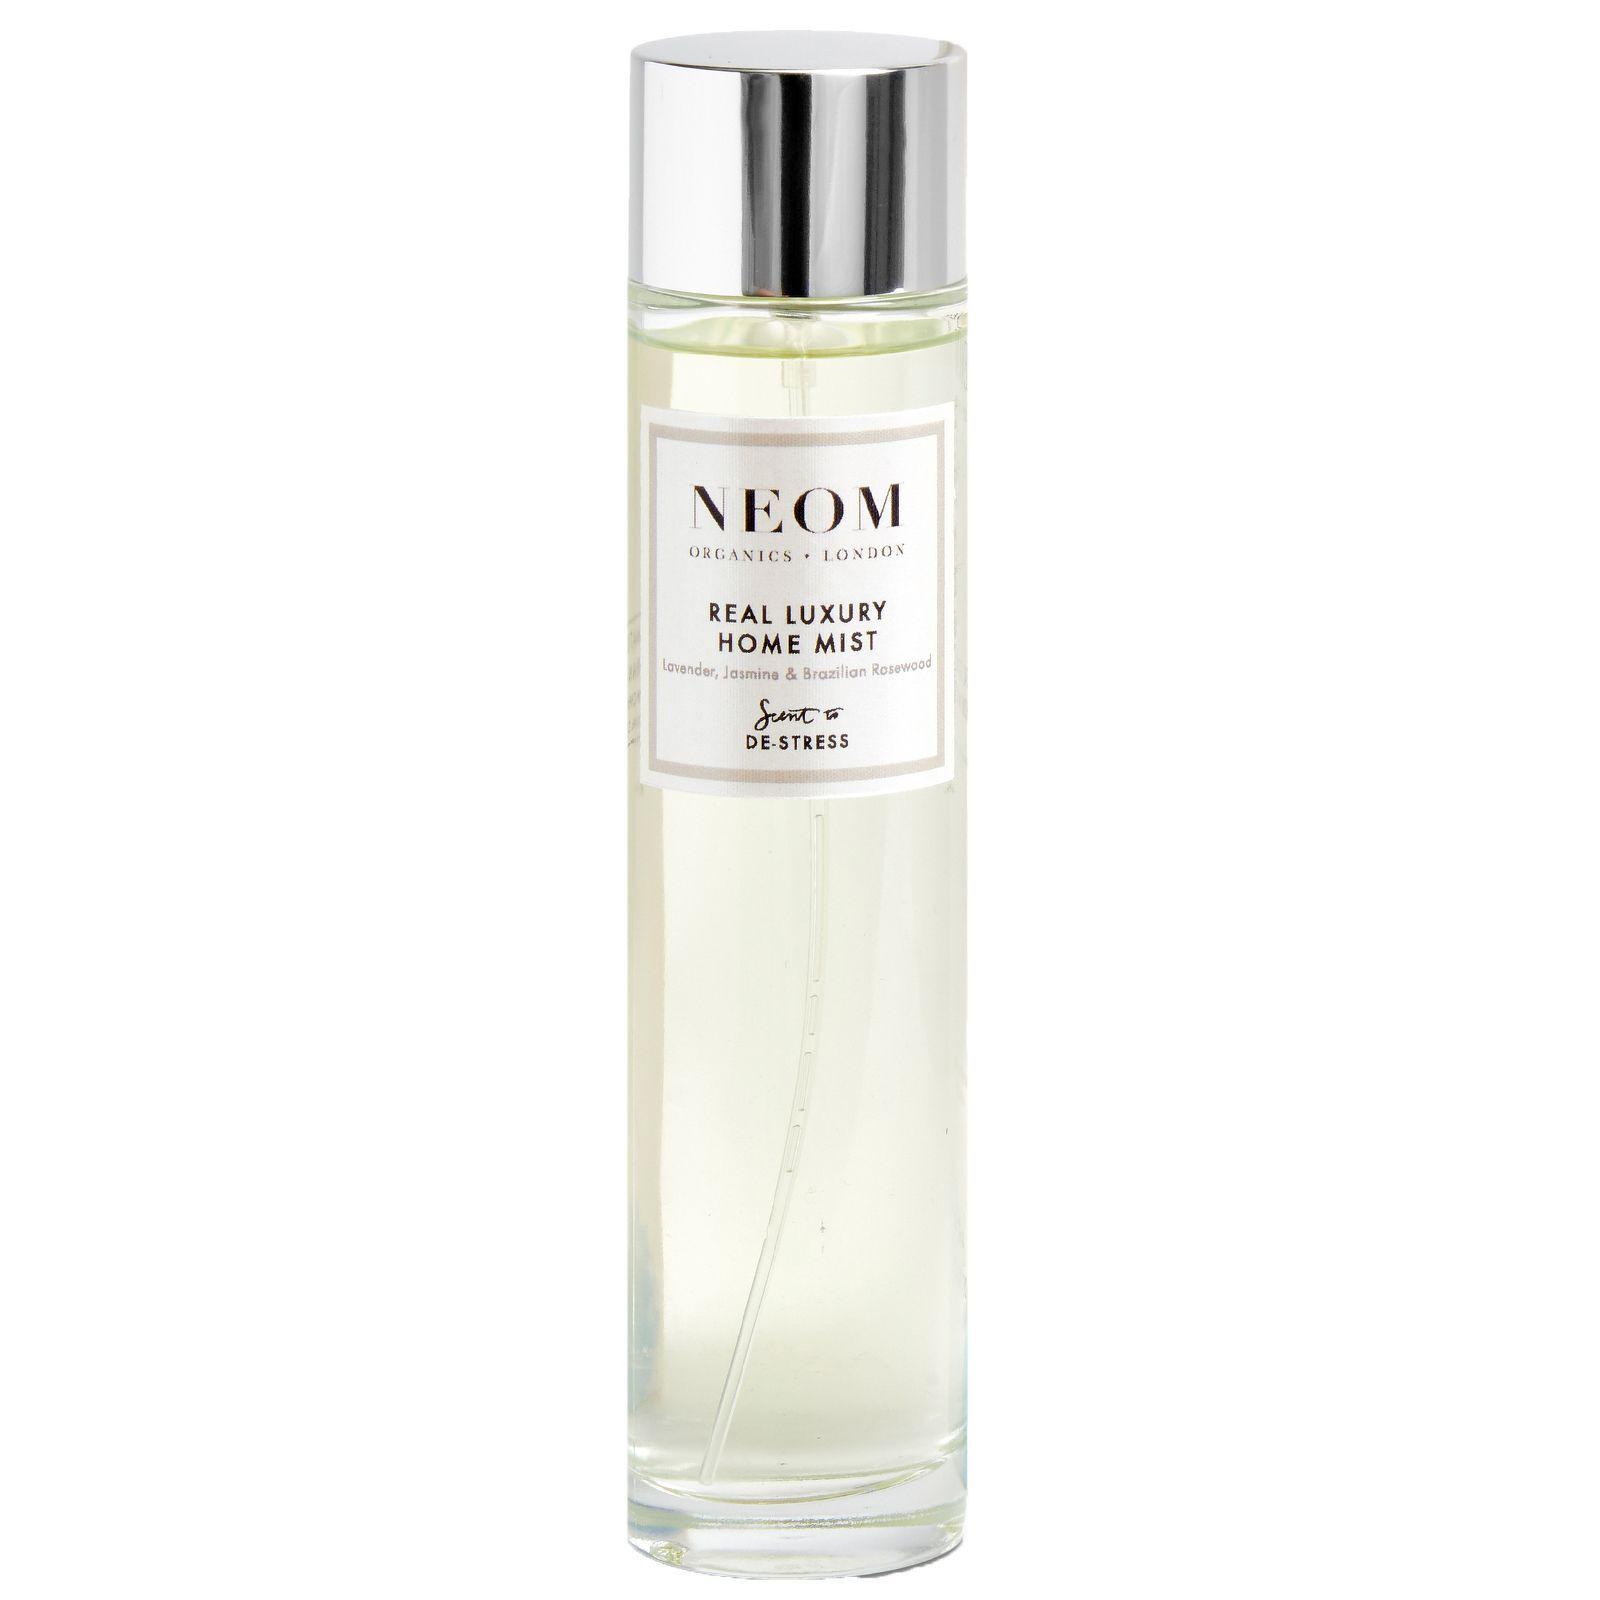 Neom Organics London - Scent To De-Stress Real Luxury Home Mist 100ml for Women